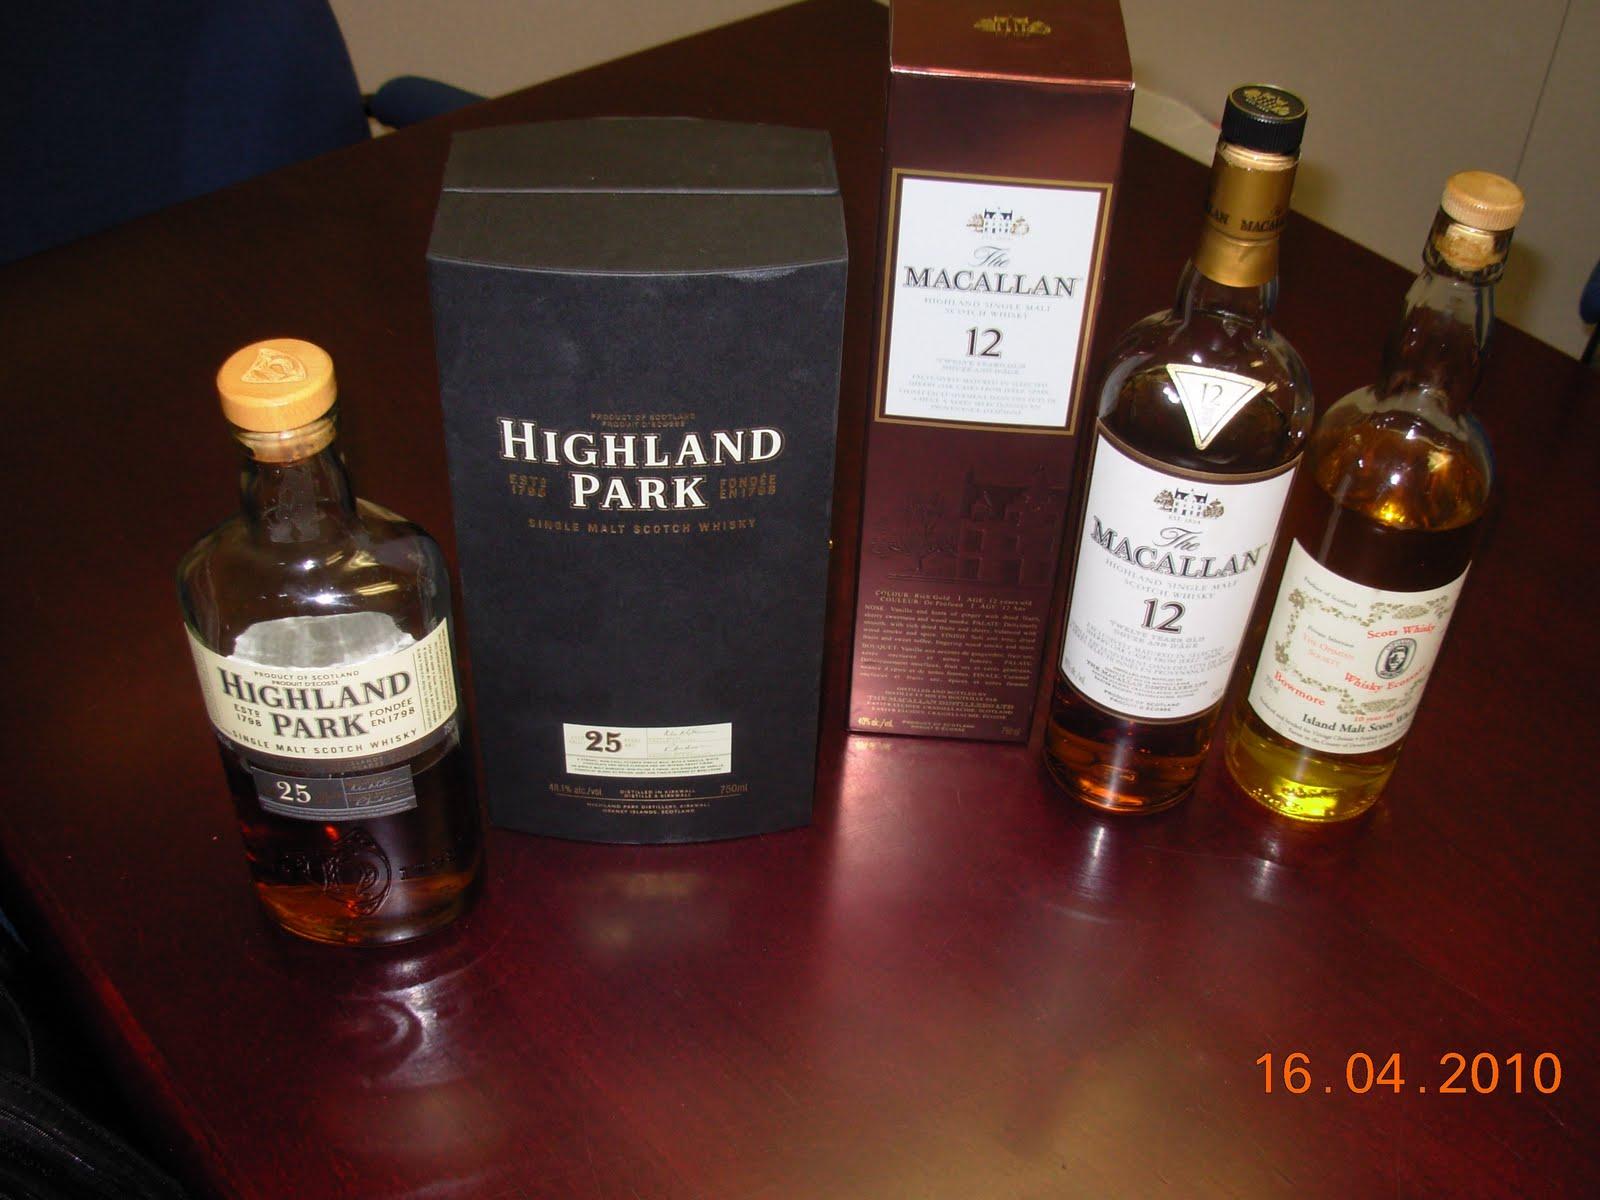 Jason s Scotch Whisky Reviews April 2010